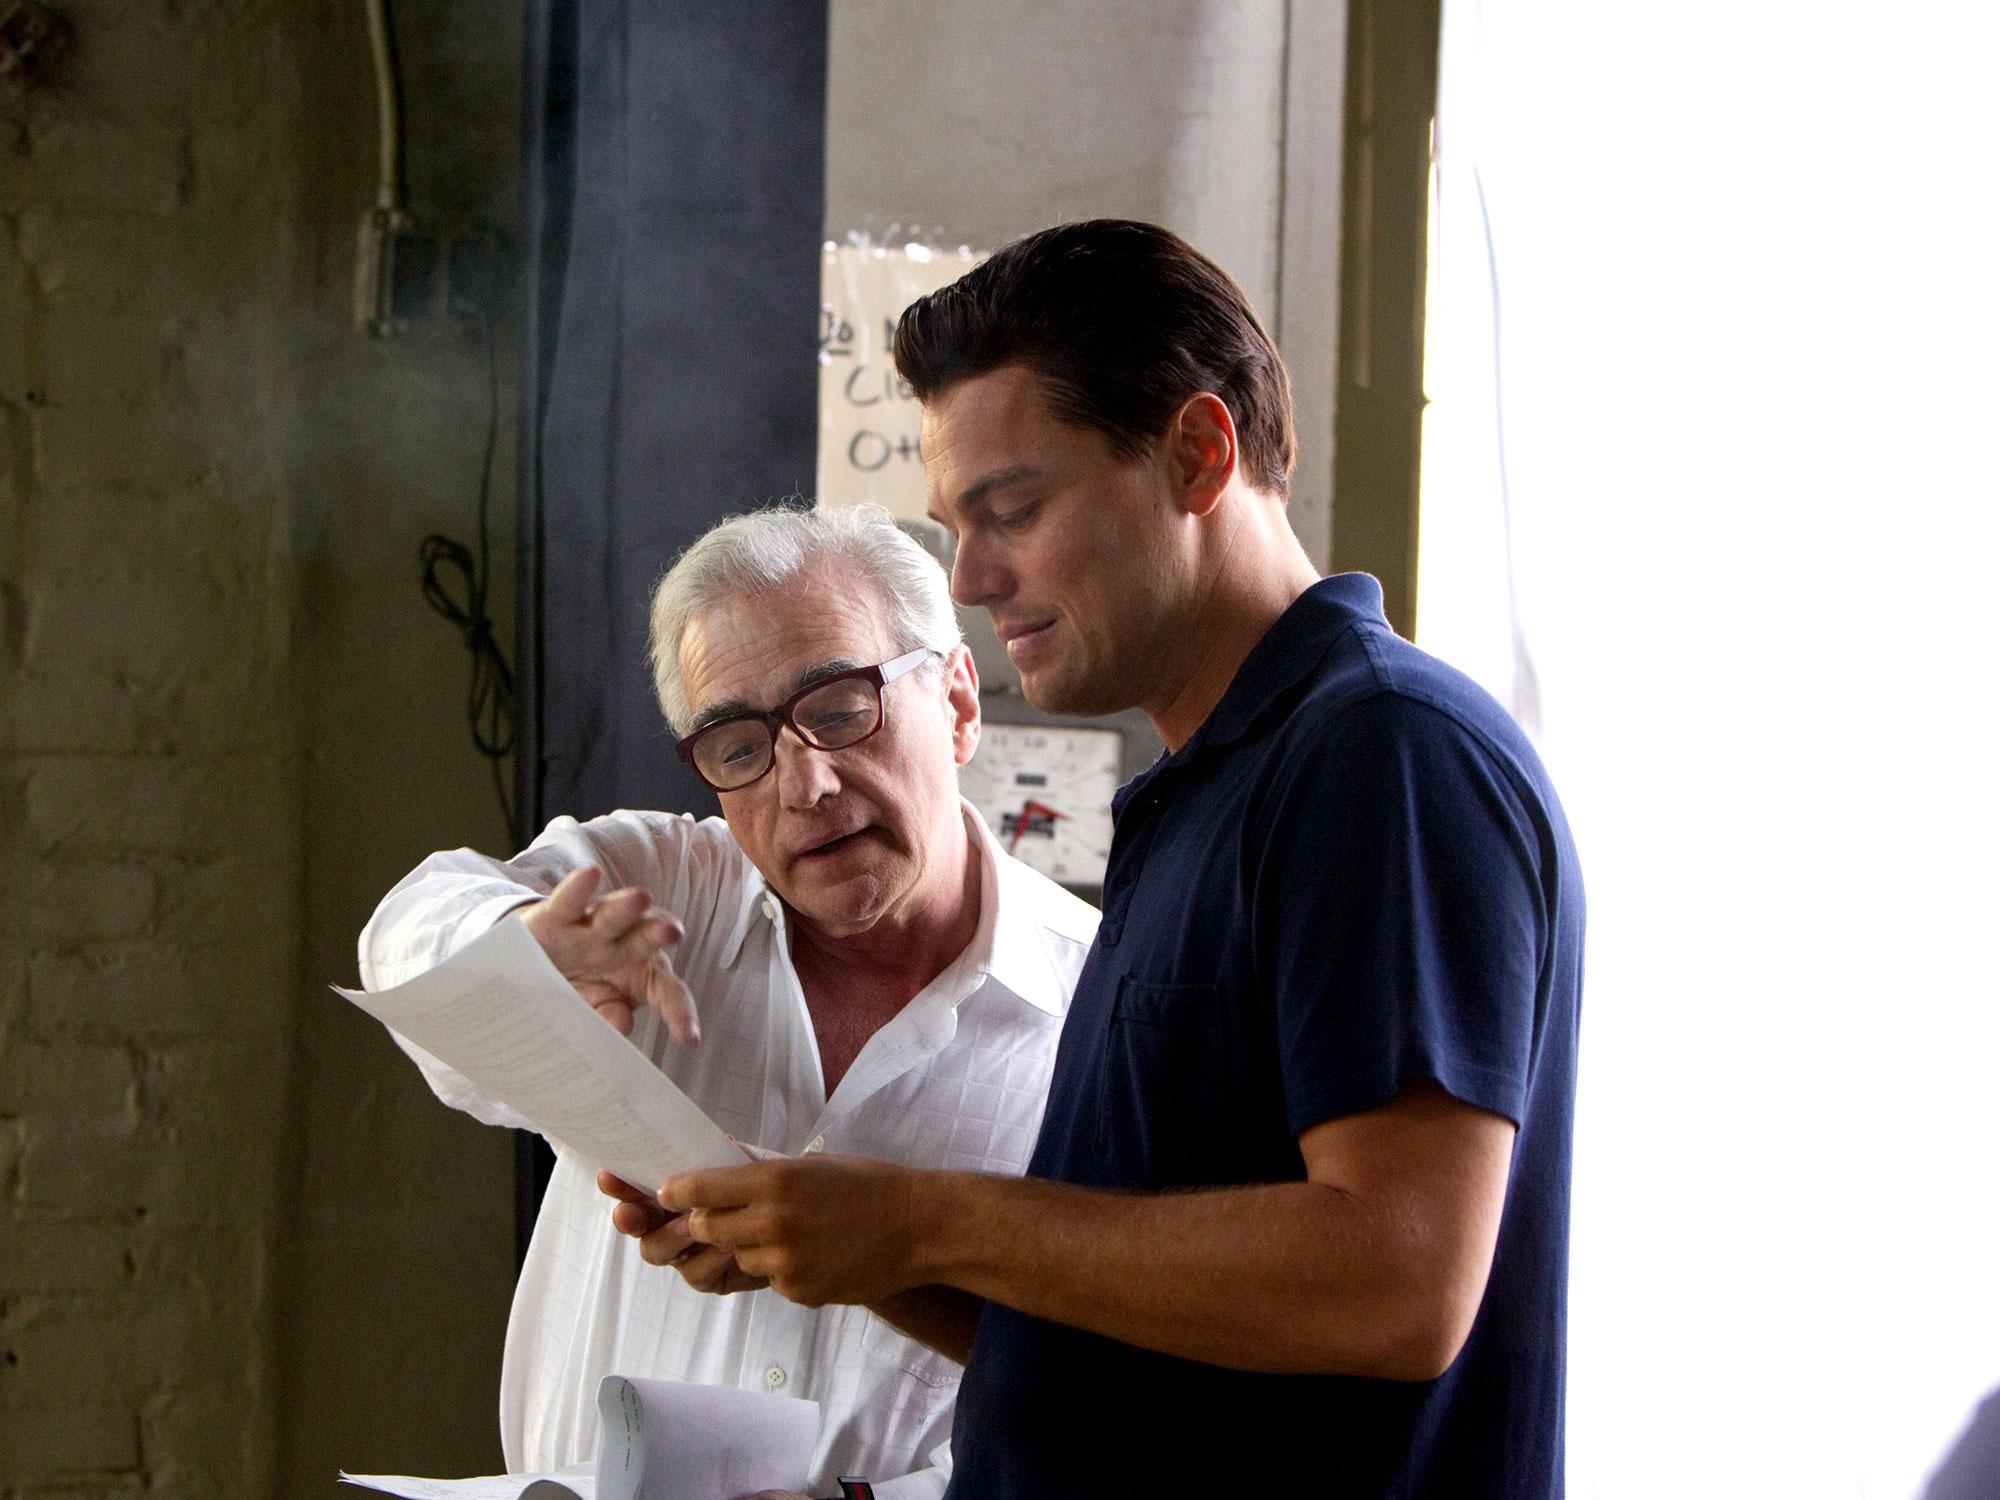 Martin Scorsese on set with Leonardo DiCaprio